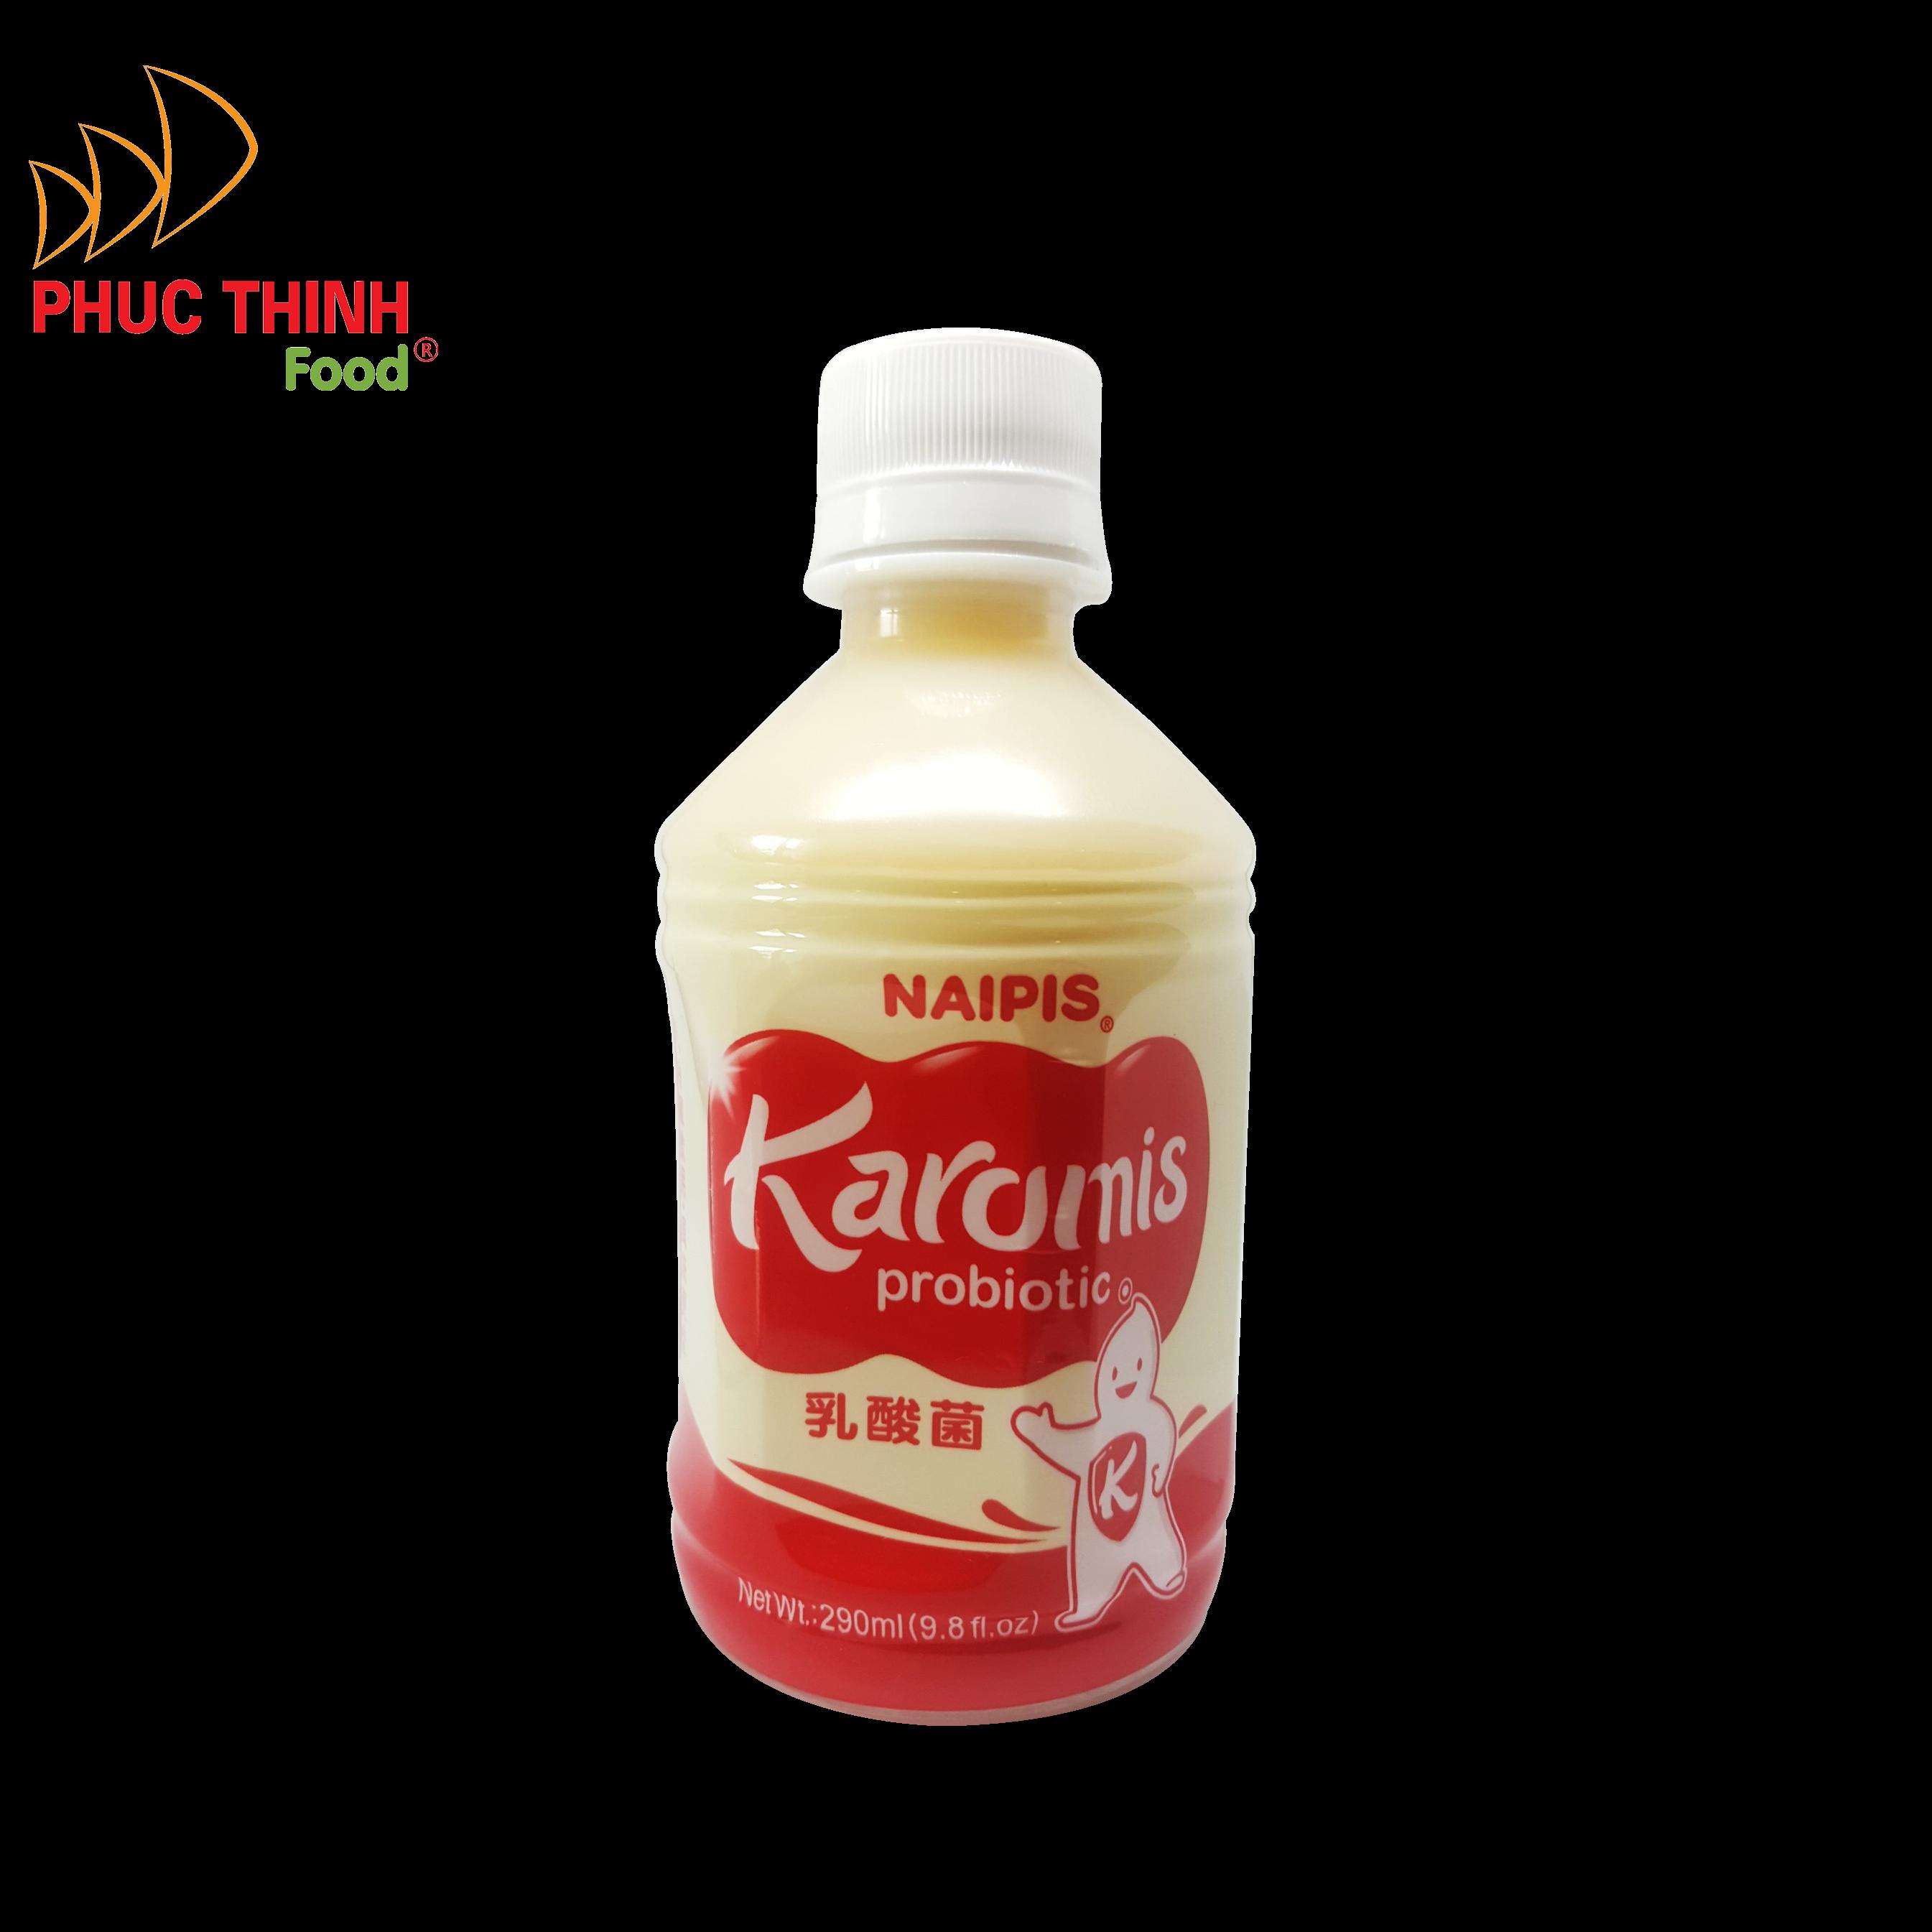 Sữa chua uống  NAIPIS KAROMIS - lợi khuẩn Probiotic